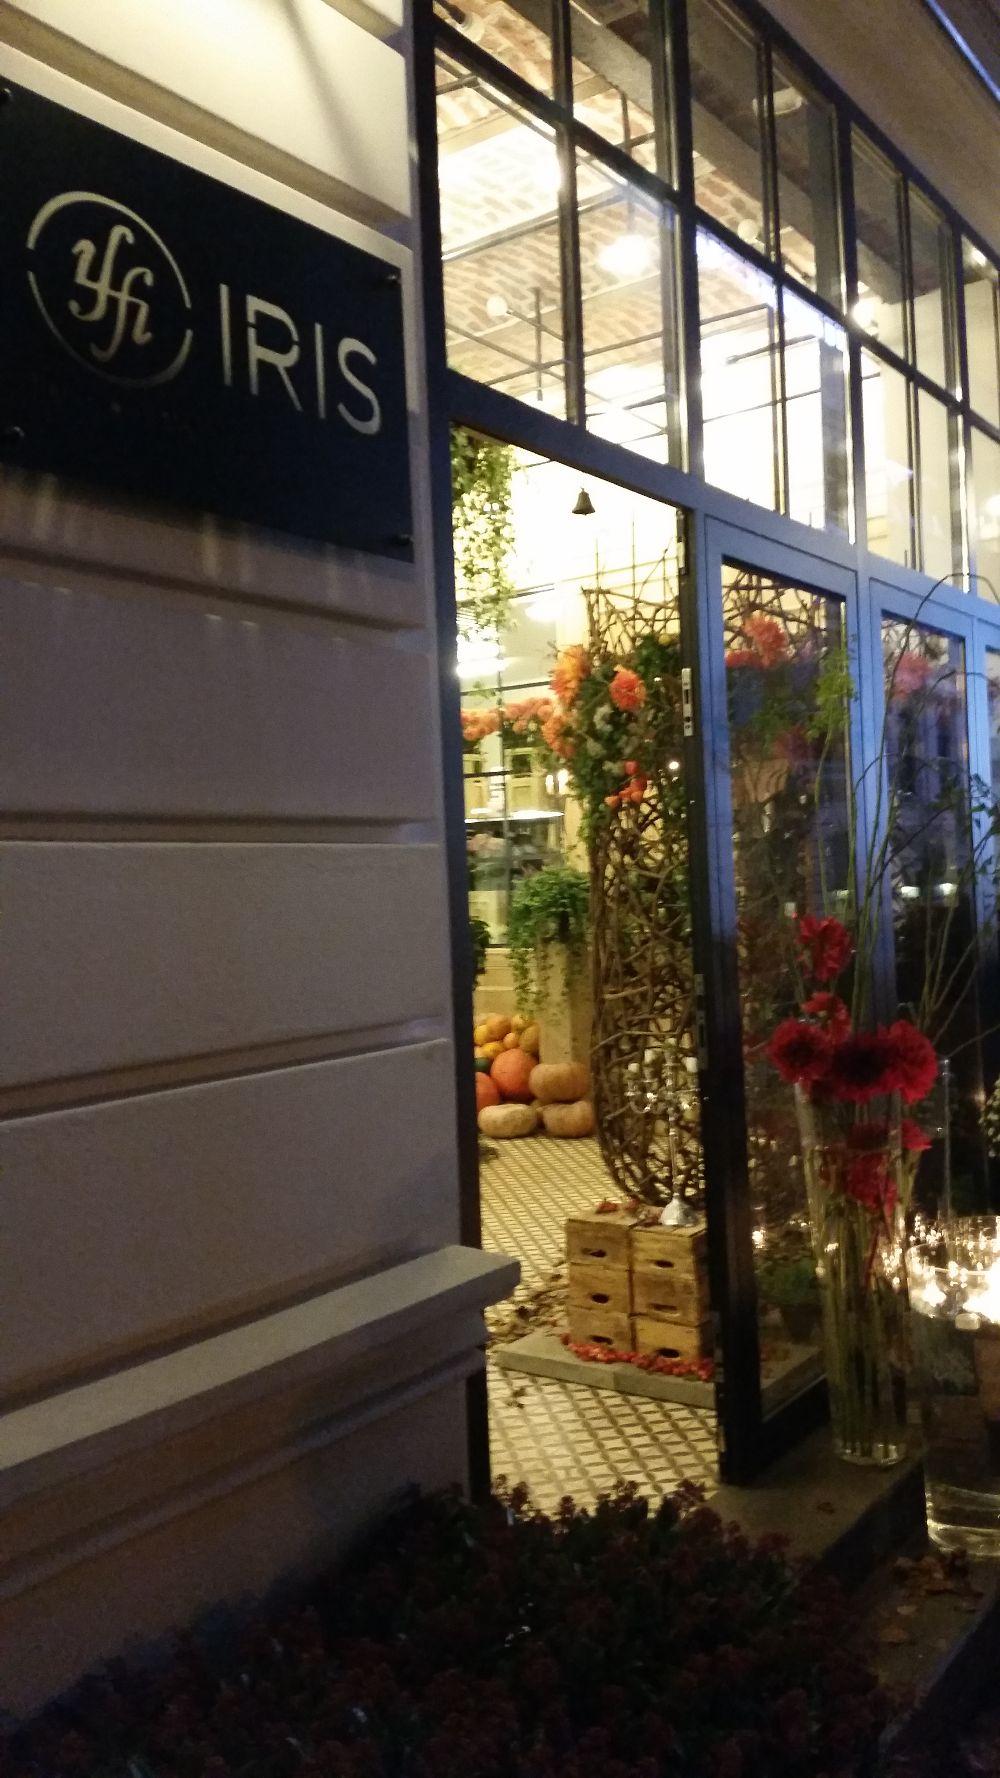 adelaparvu.com despre 45 de ani aniversare Floraria Iris, design floral Nicu Bocancea (43)